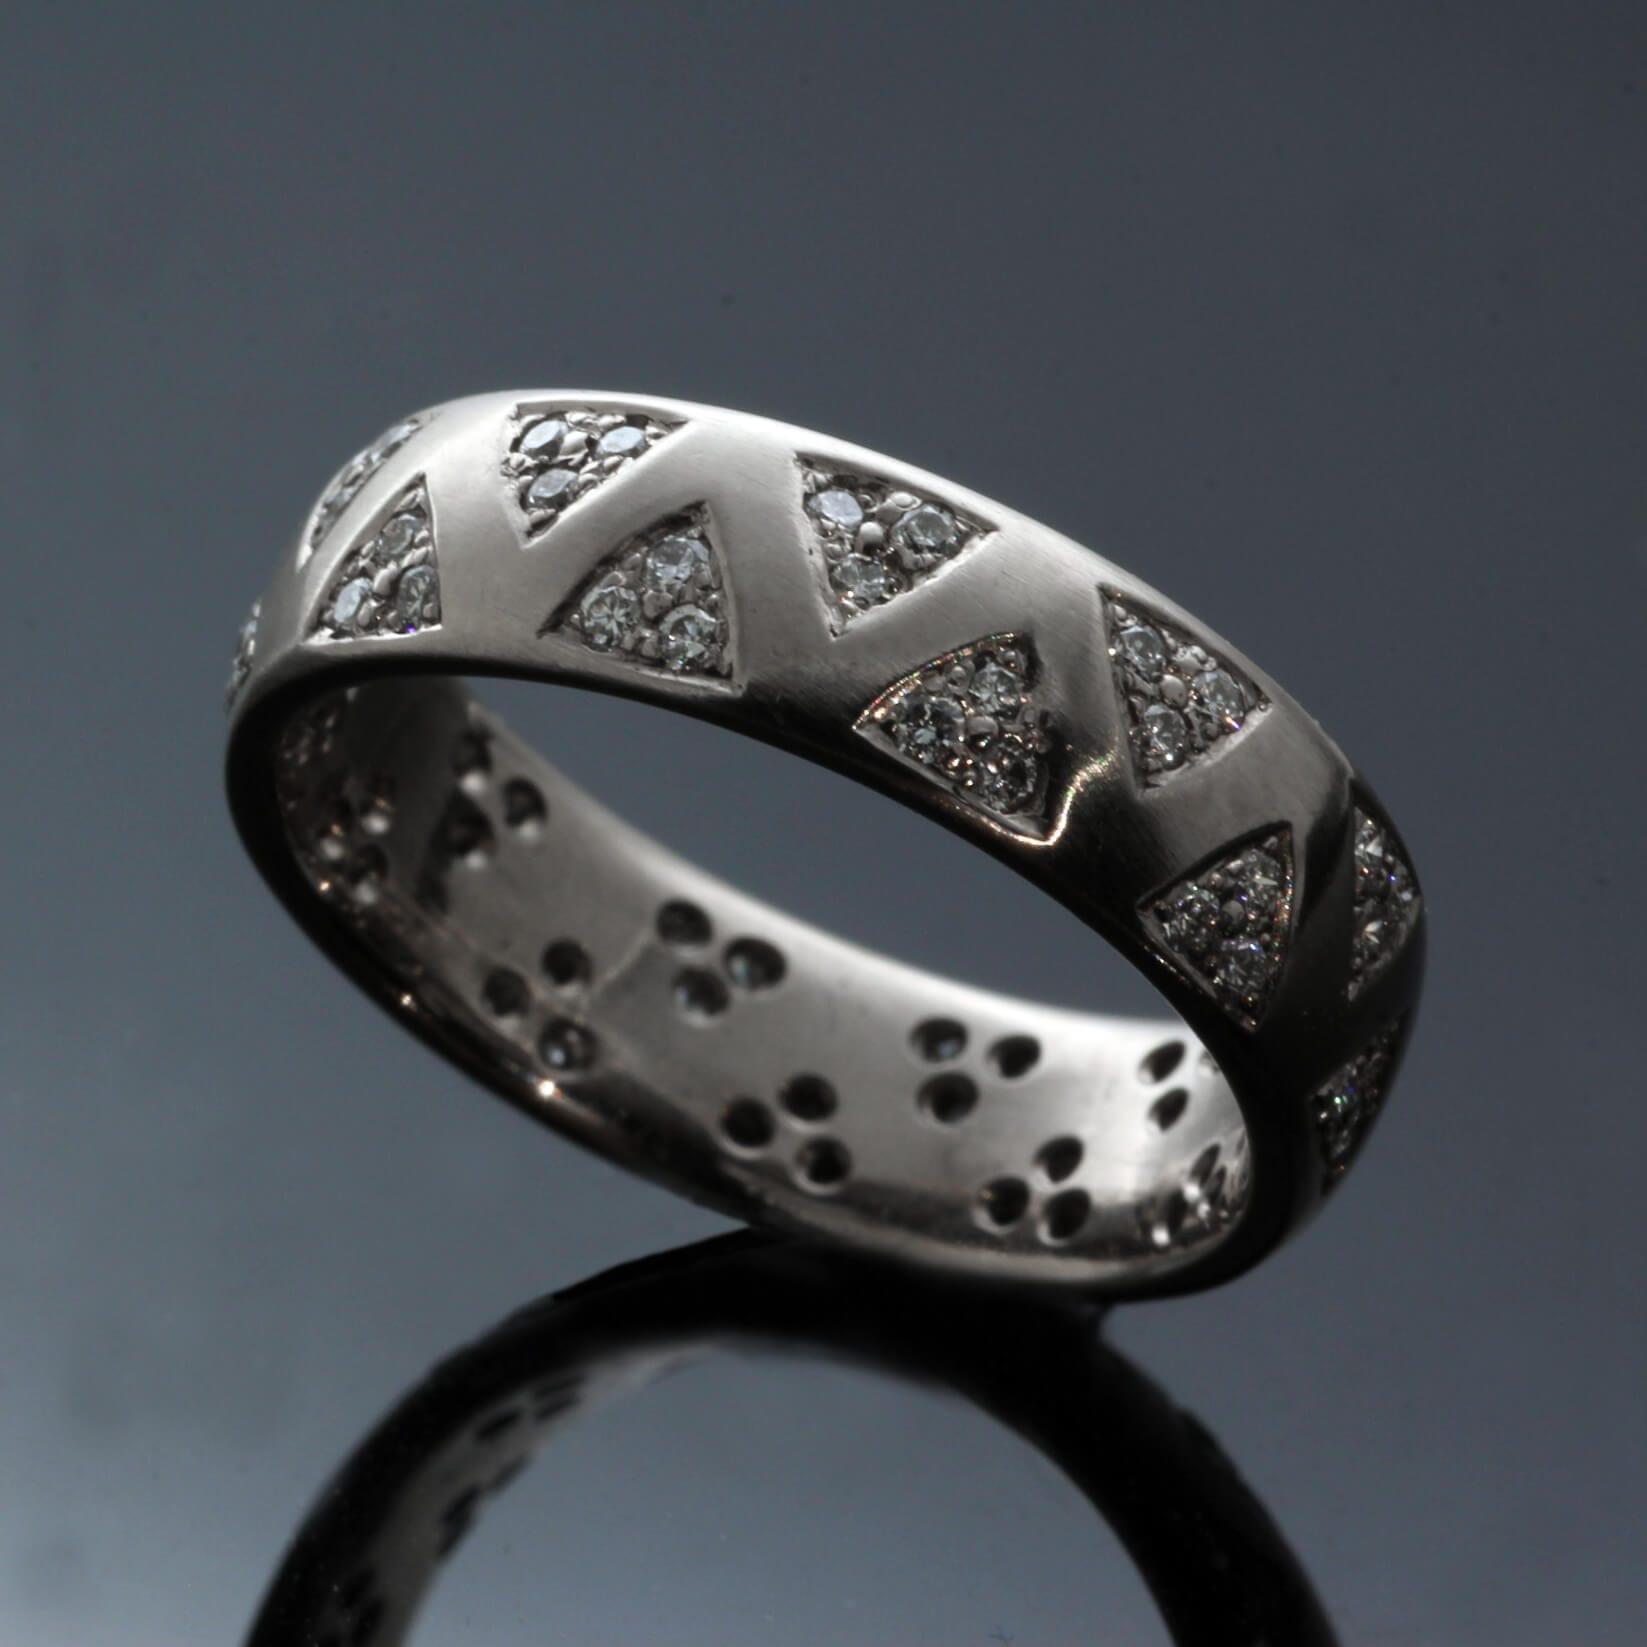 Contemporary White Gold pave set Diamond wedding eternity contemporary ring